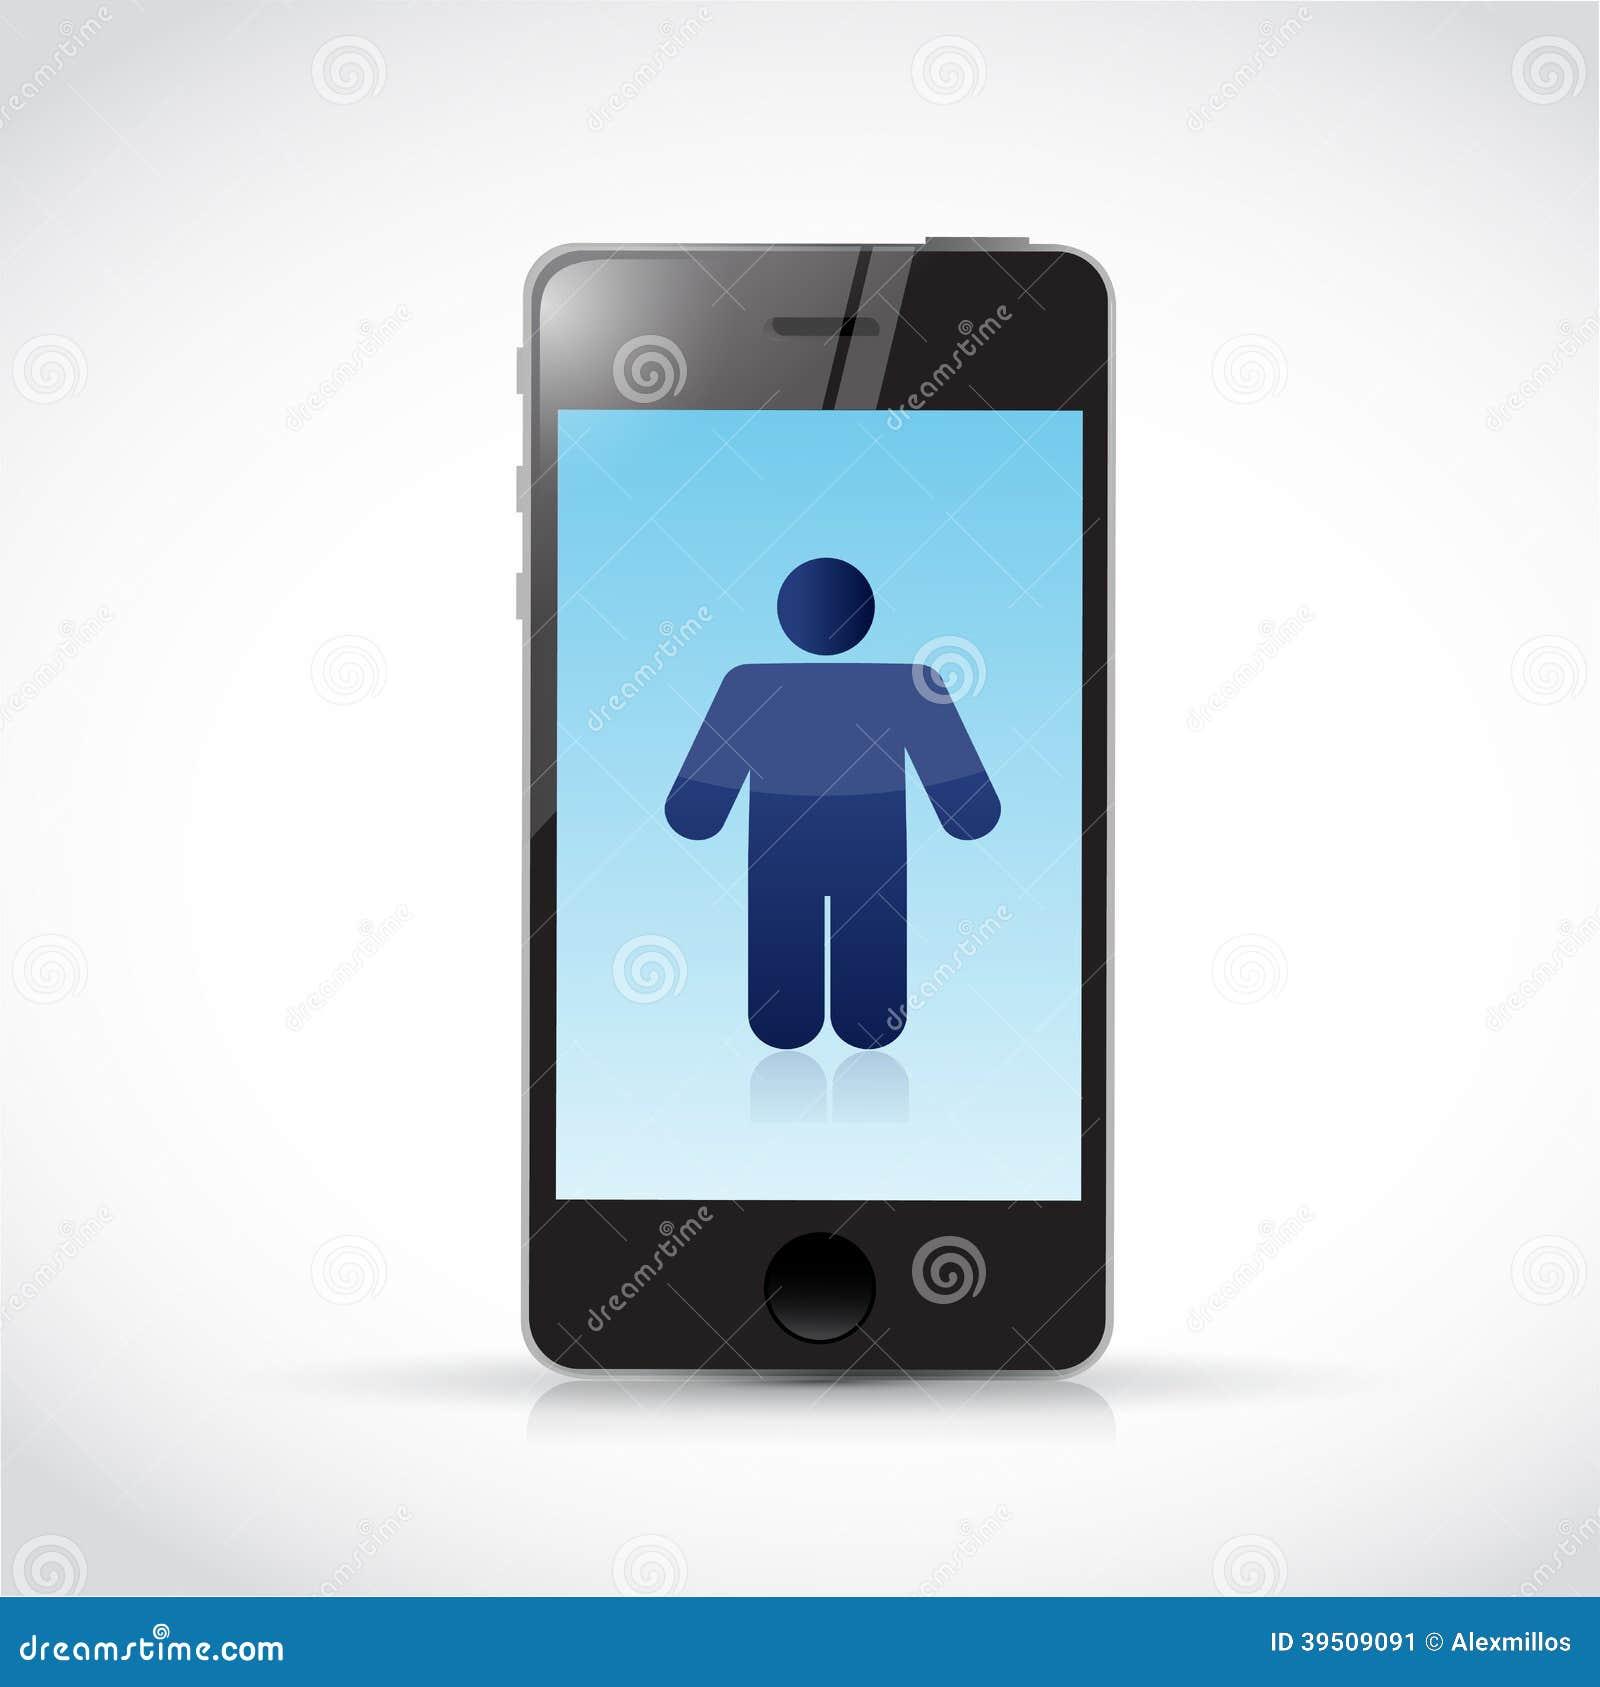 Phone and avatar illustration design